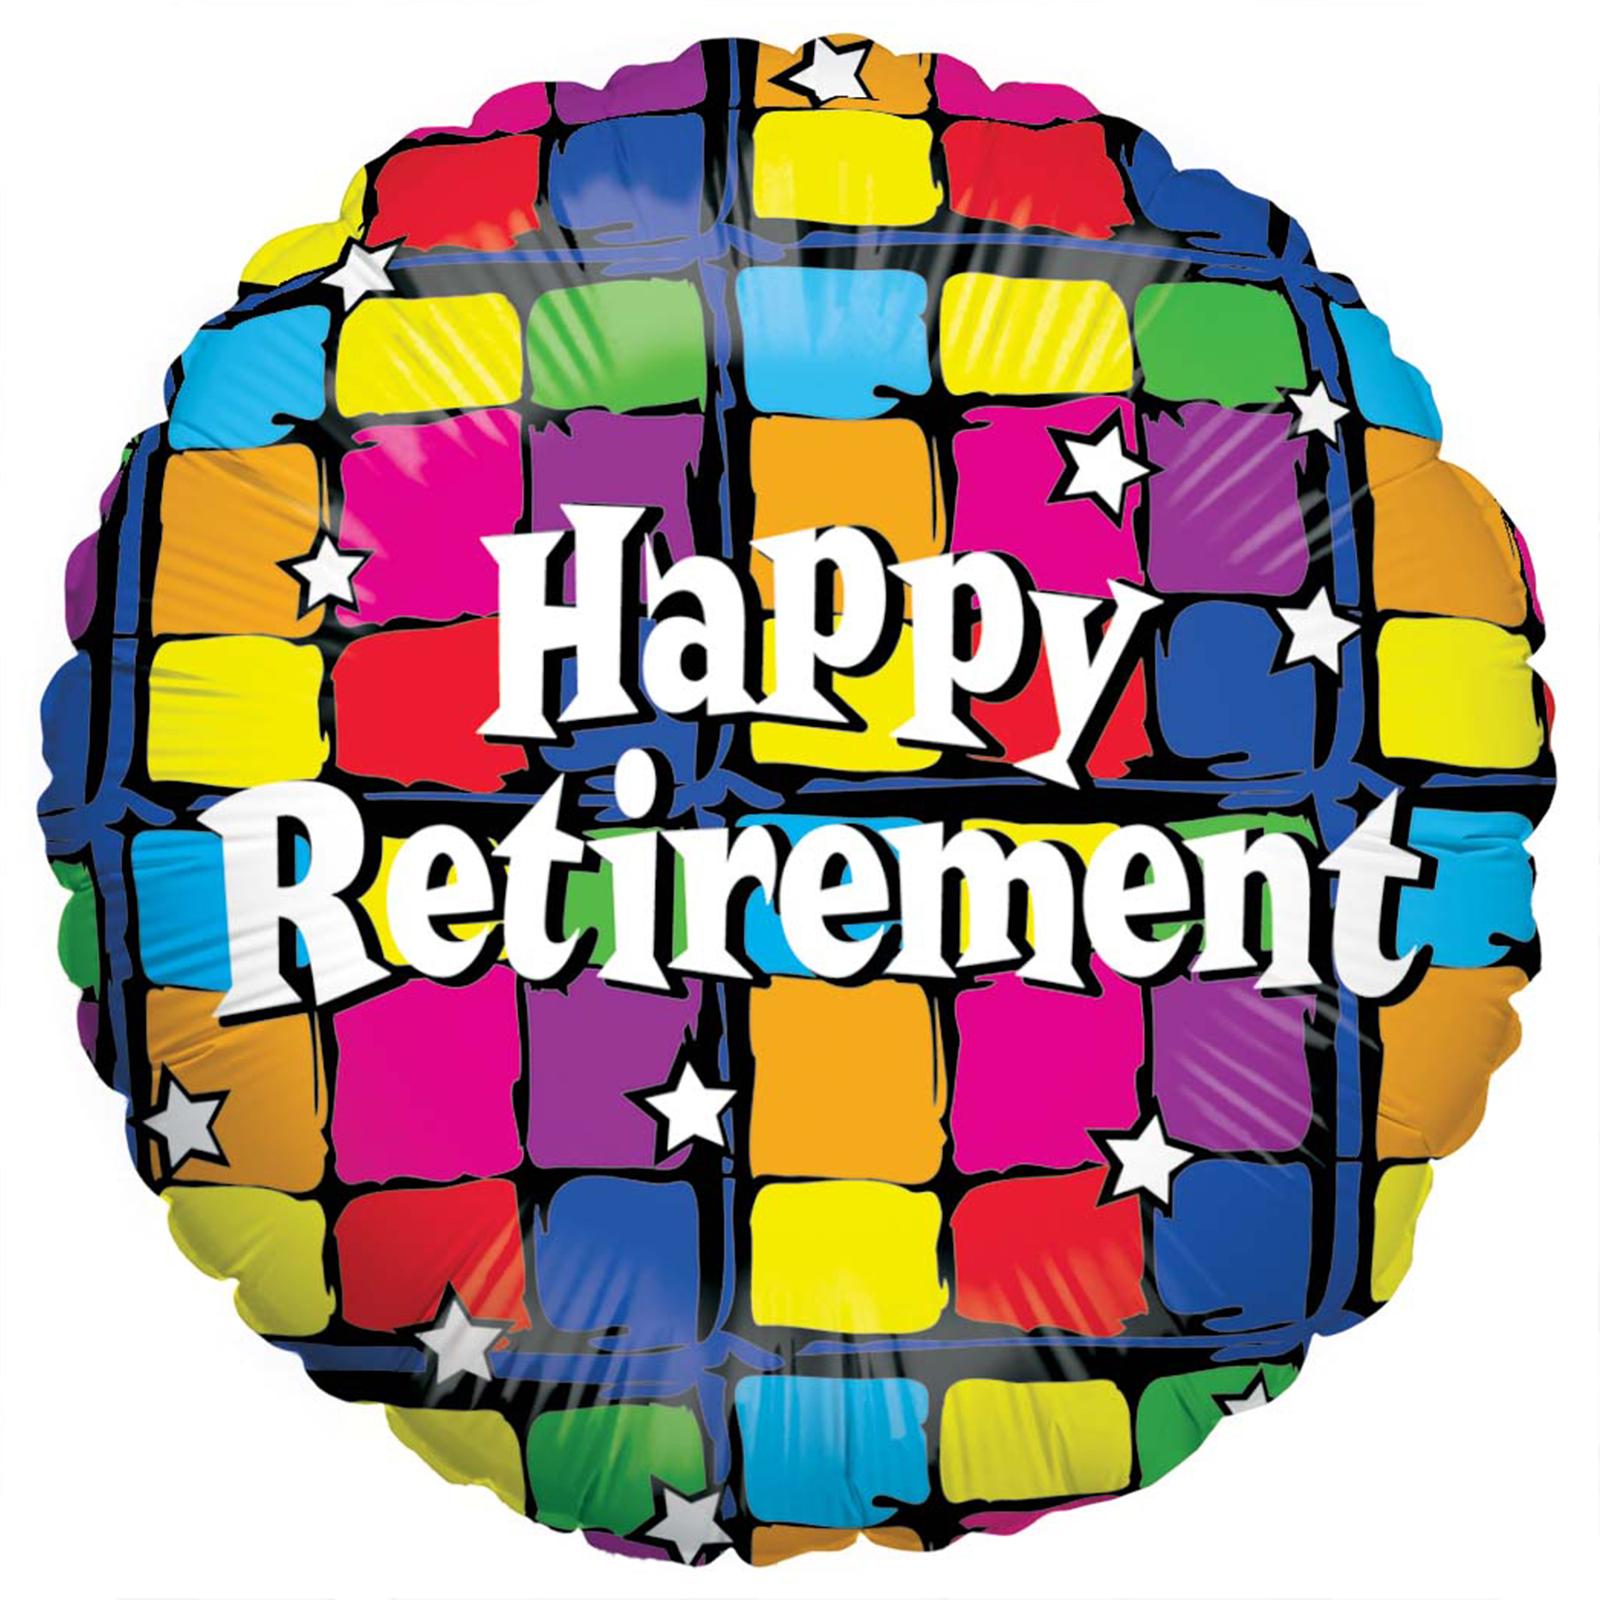 1600x1600 Retirement Download Free Tire Clipart Clipartmonk Free Clip Art